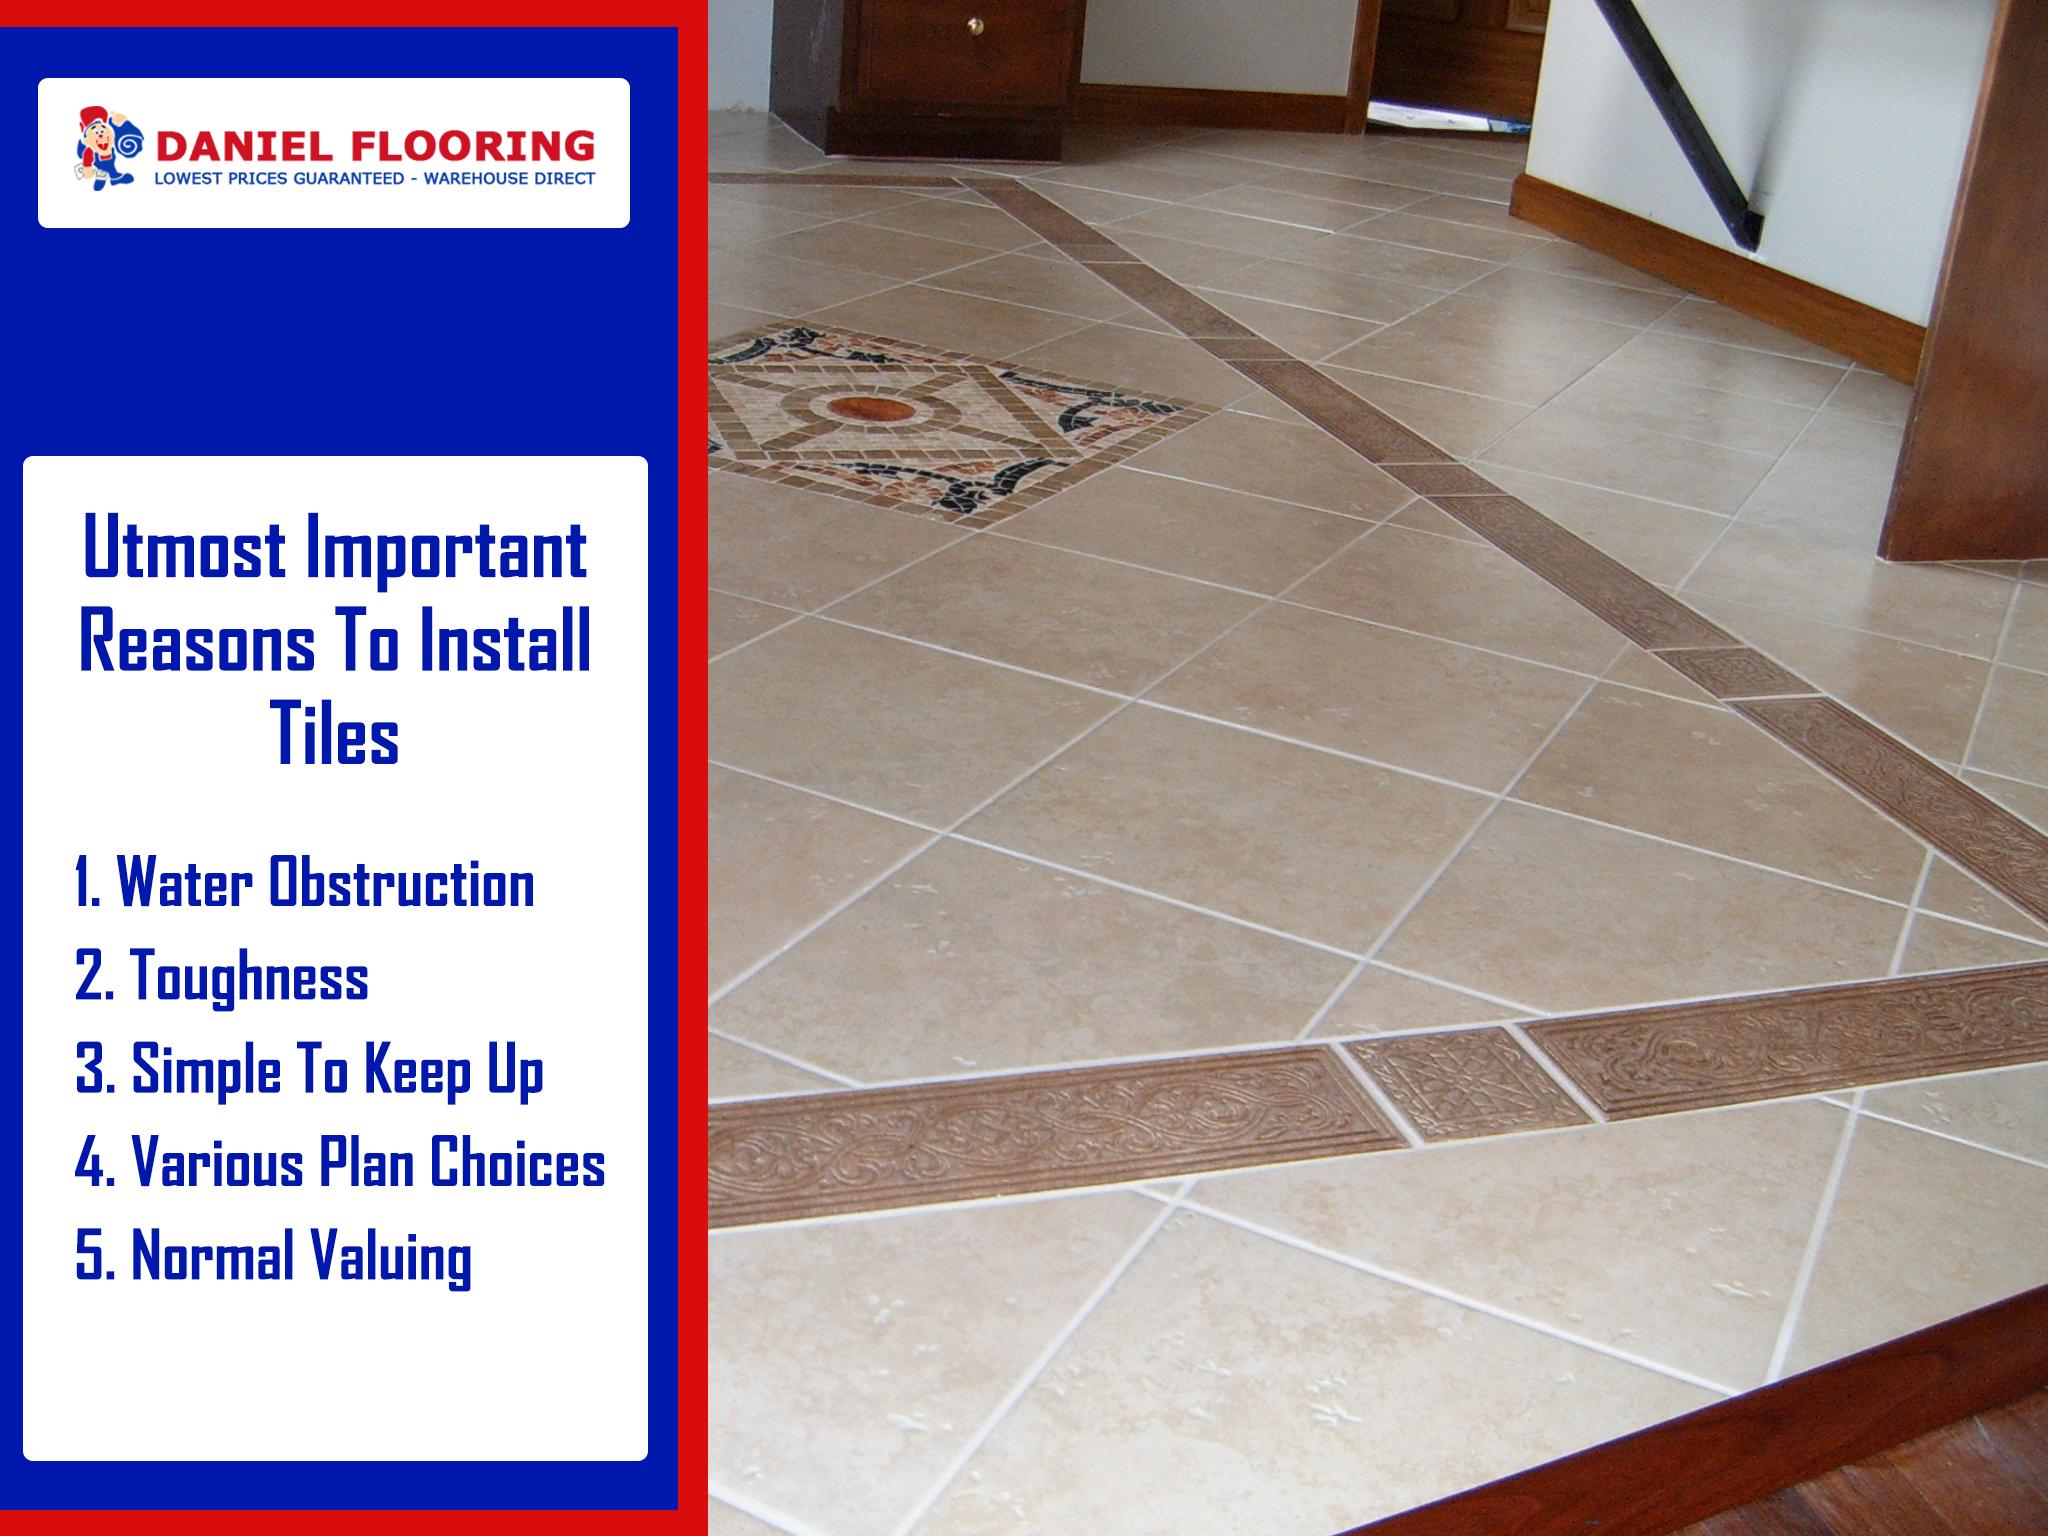 utmost important reasons to install tiles daniel flooring